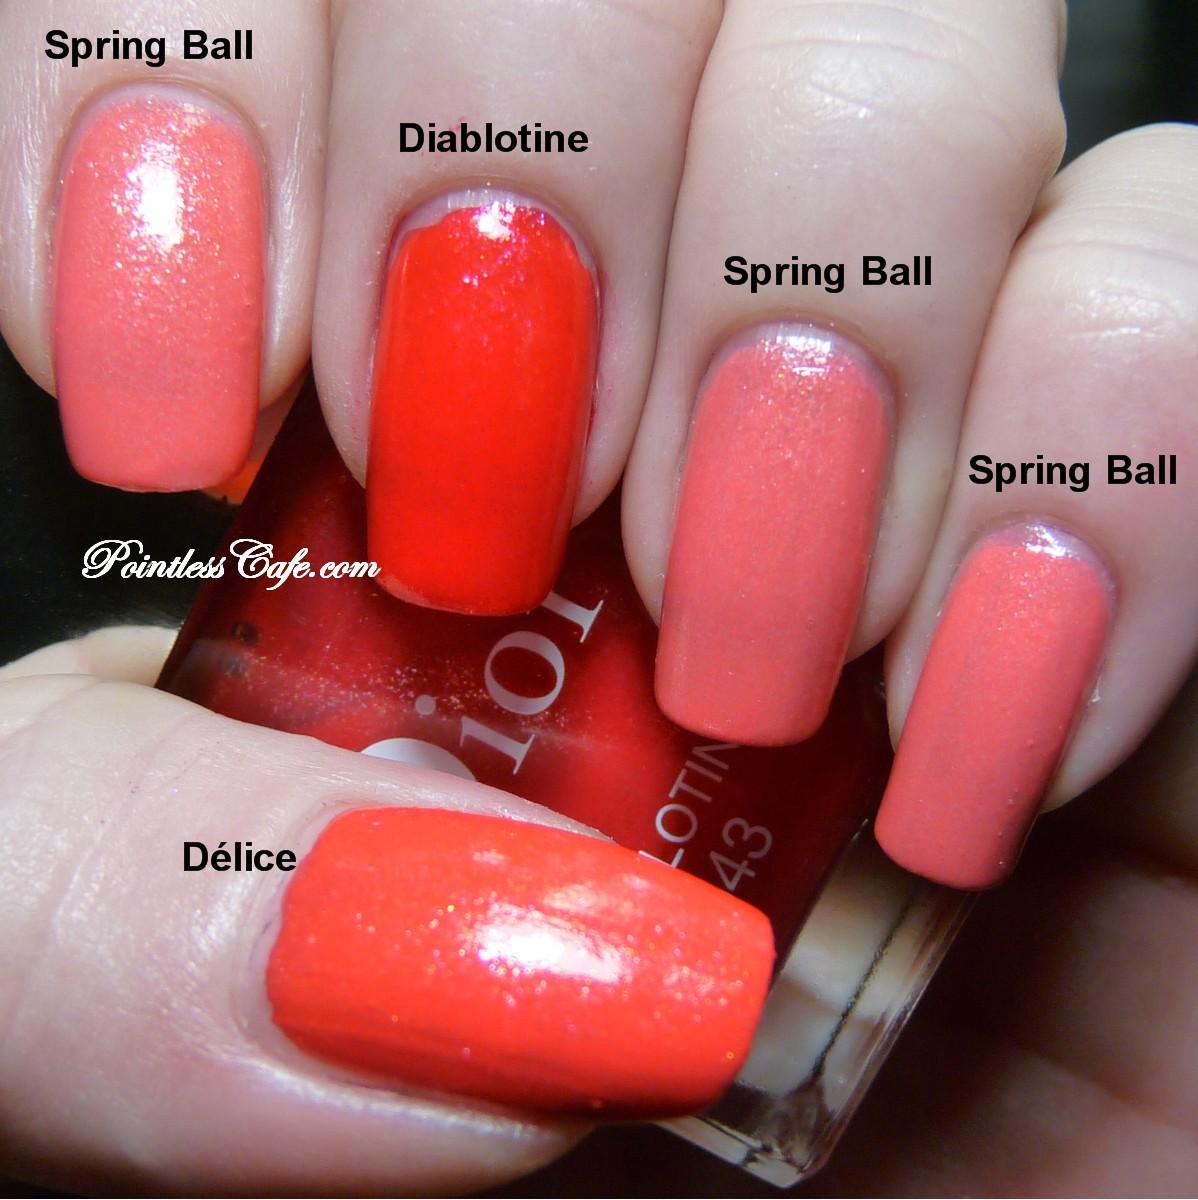 Dior Spring Ball vs Dior Délice vs Dior Diablotine